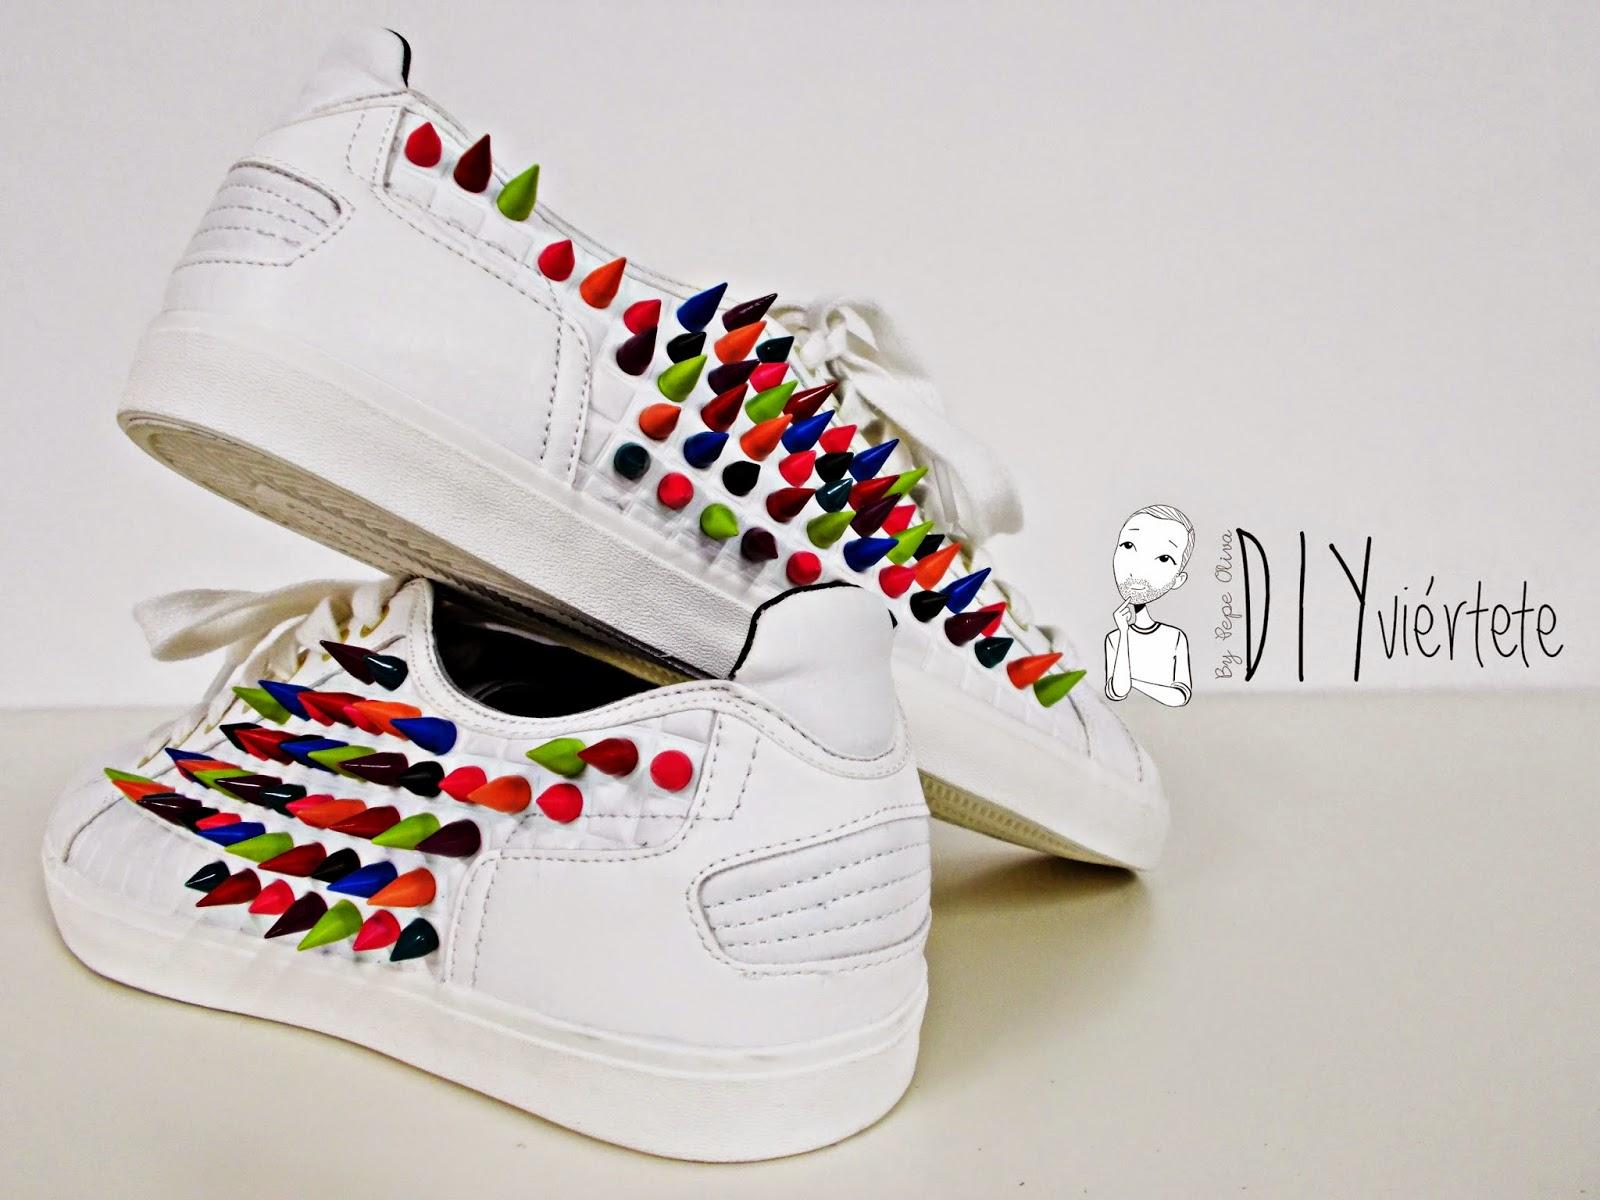 DIY-zapatillas-tunear-customizar-CHRISTIAN-LOUBOUTIN-zapatos-pinchos-esmaltes-pinta uñas-colores-1